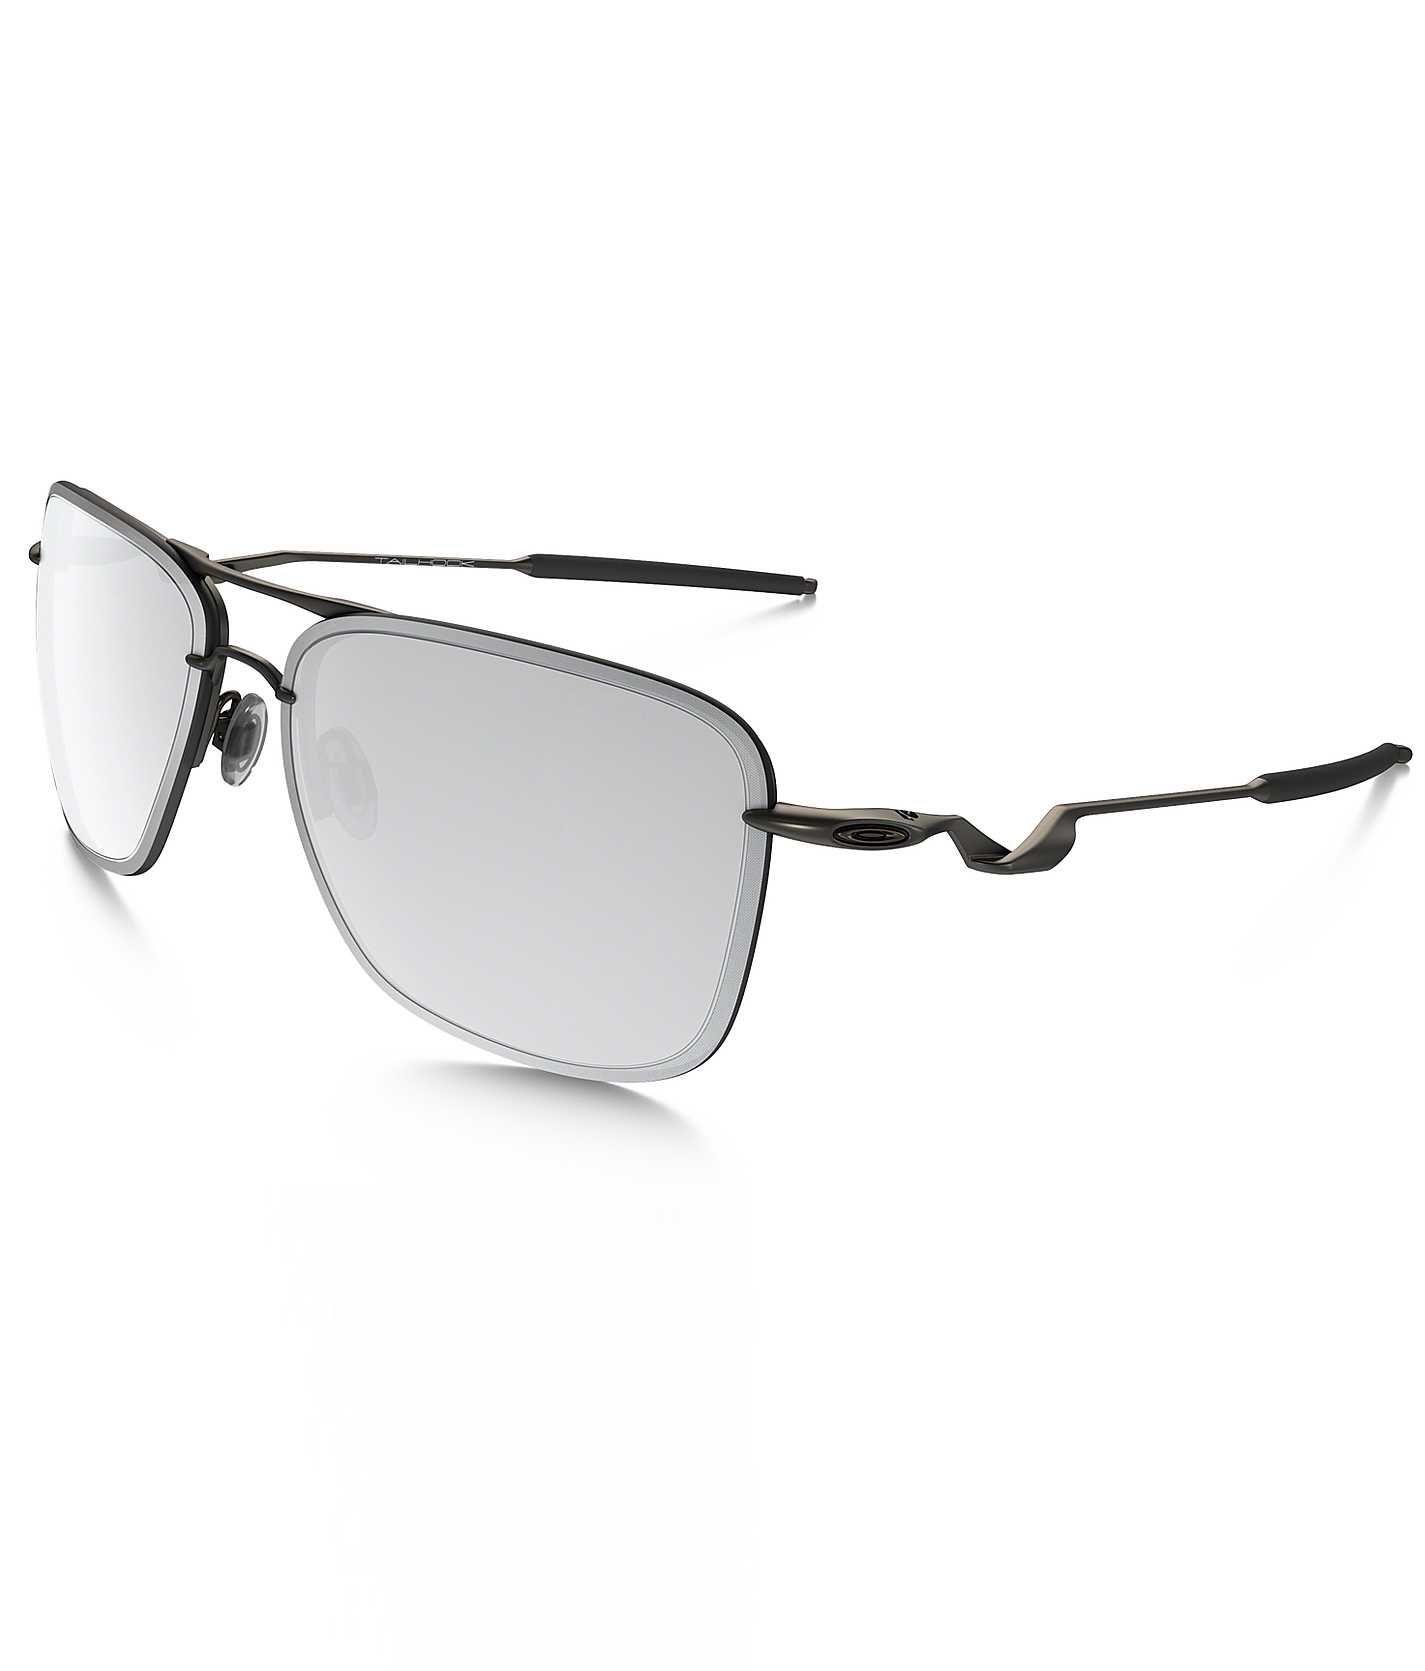 7c6f22b6d00 Oakley Tailhook Sunglasses - Men s Accessories